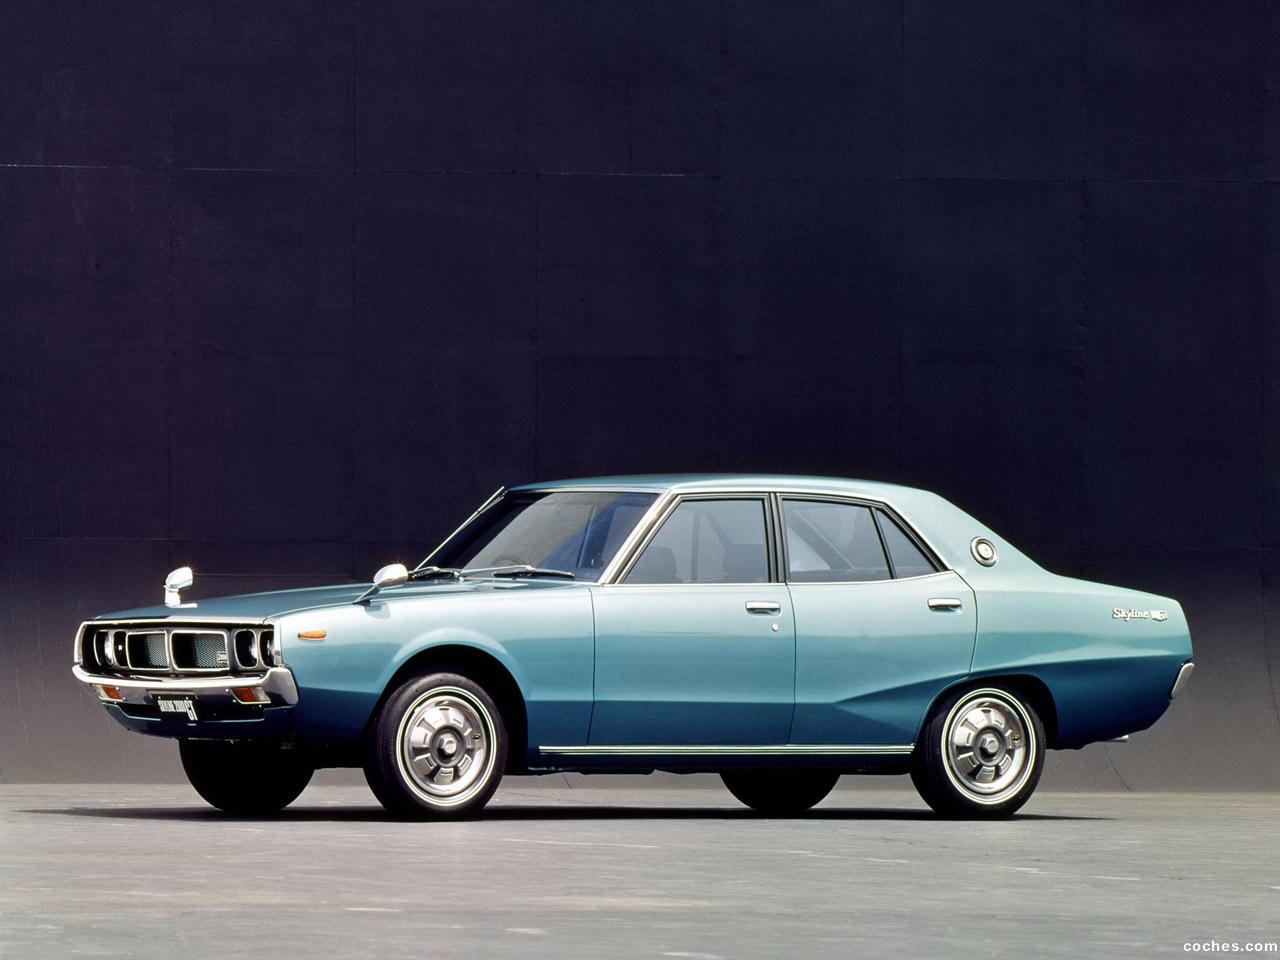 Foto 0 de Nissan Skyline 2000 GT GC110 1972